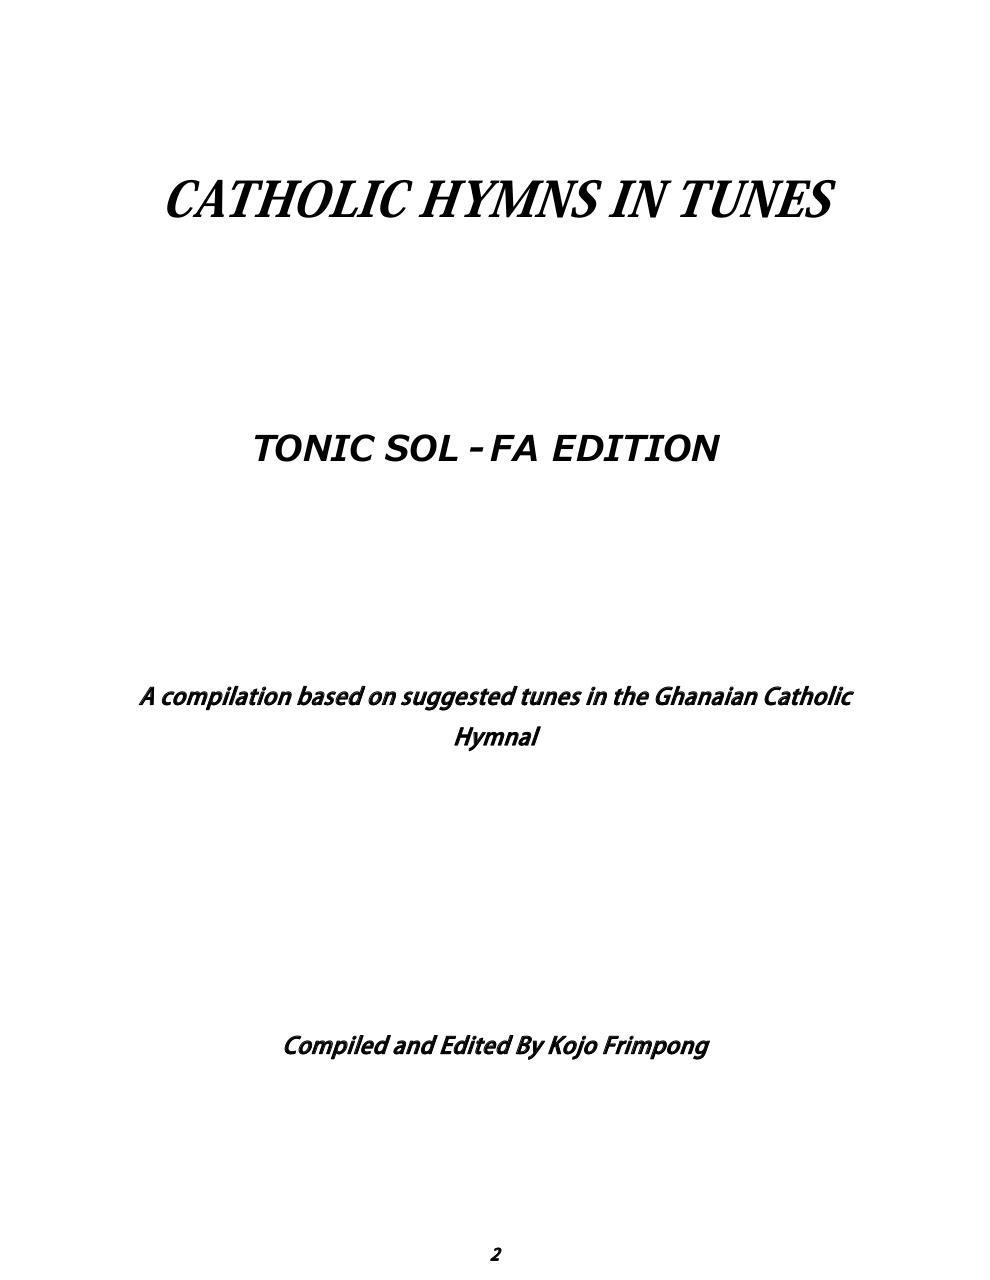 Catholic Hymns Tunes by Kojo Frimpong - catholic mass hymnal